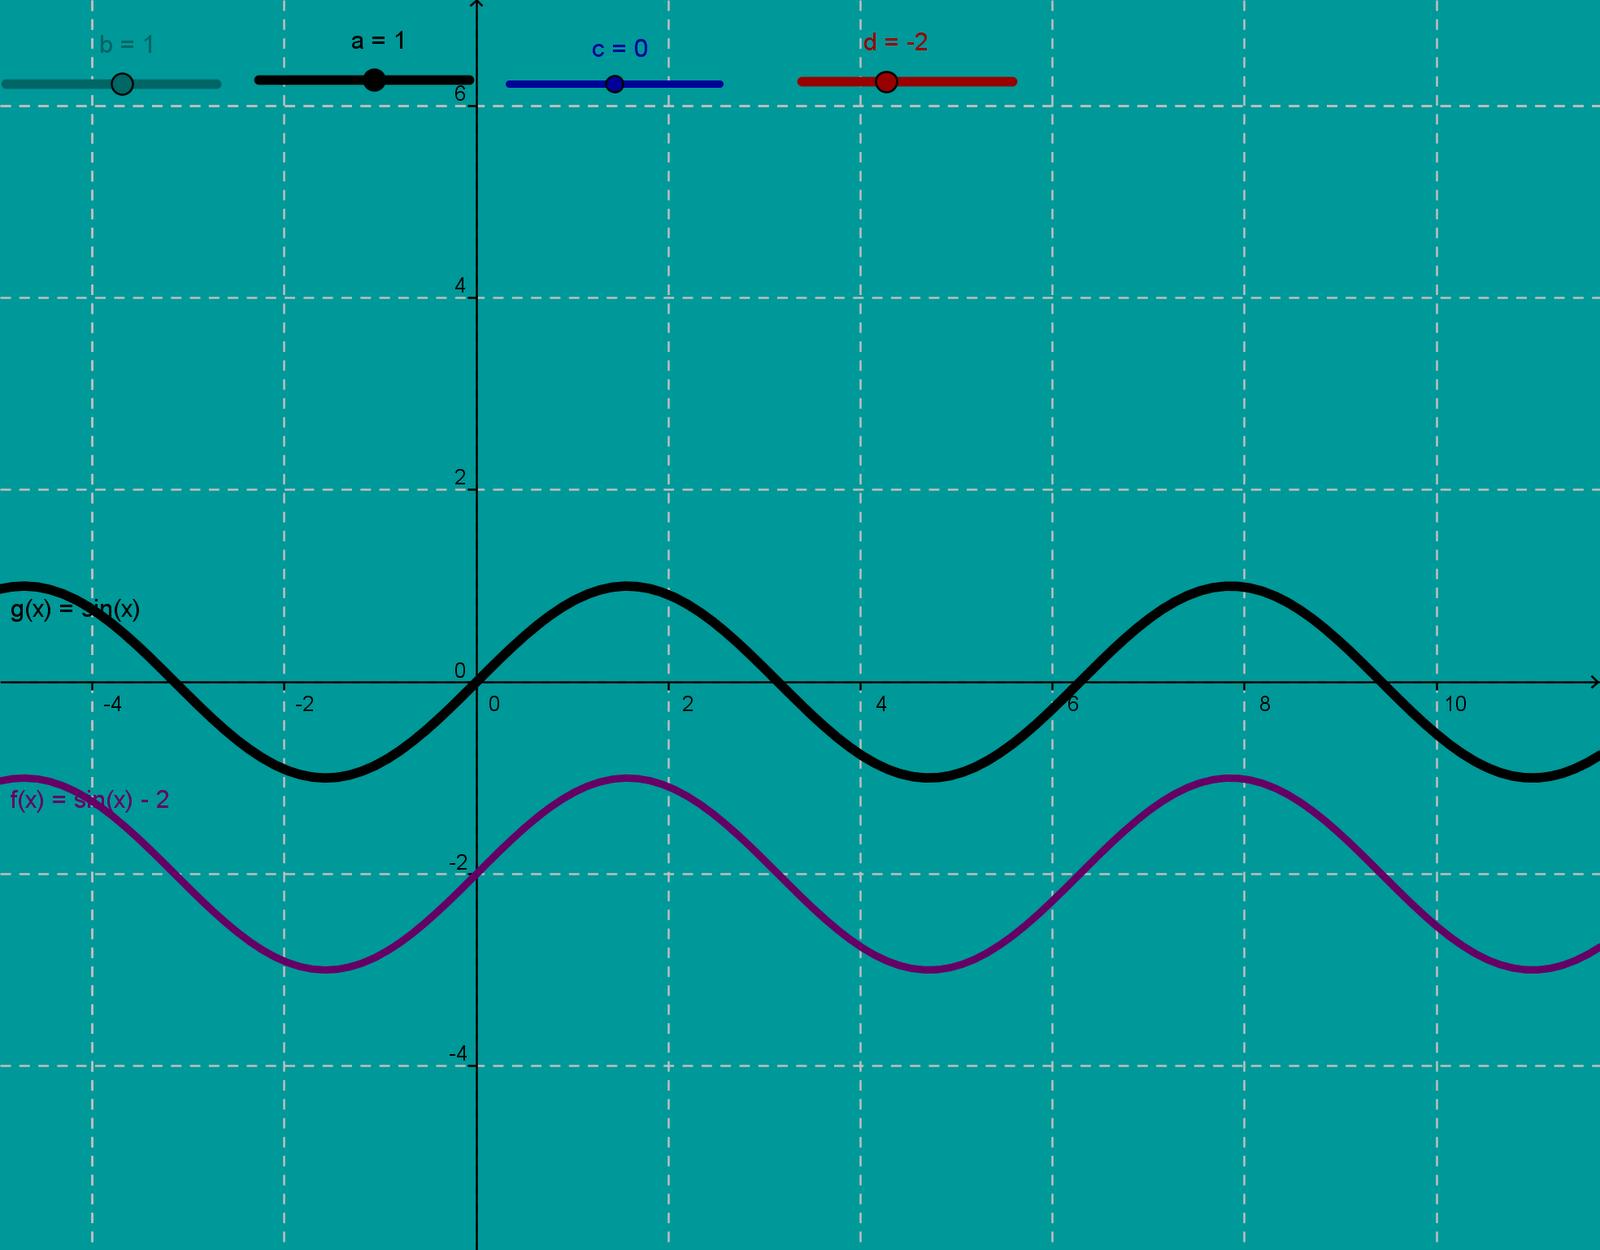 funciones trigonometricas dominio rango: